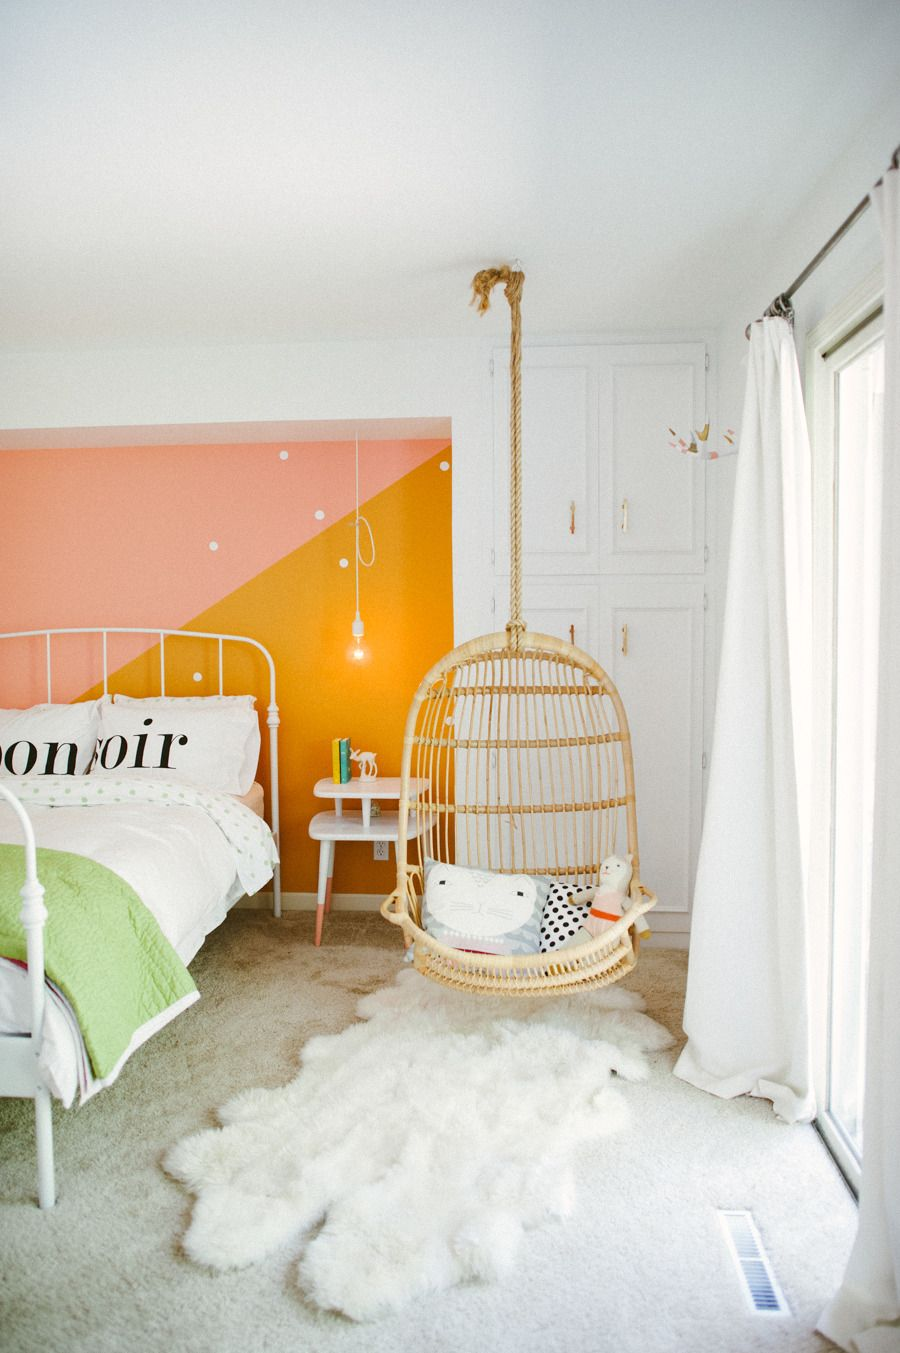 43 of the cutest kids rooms the internet has ever seen for Cuartos de ninas feos